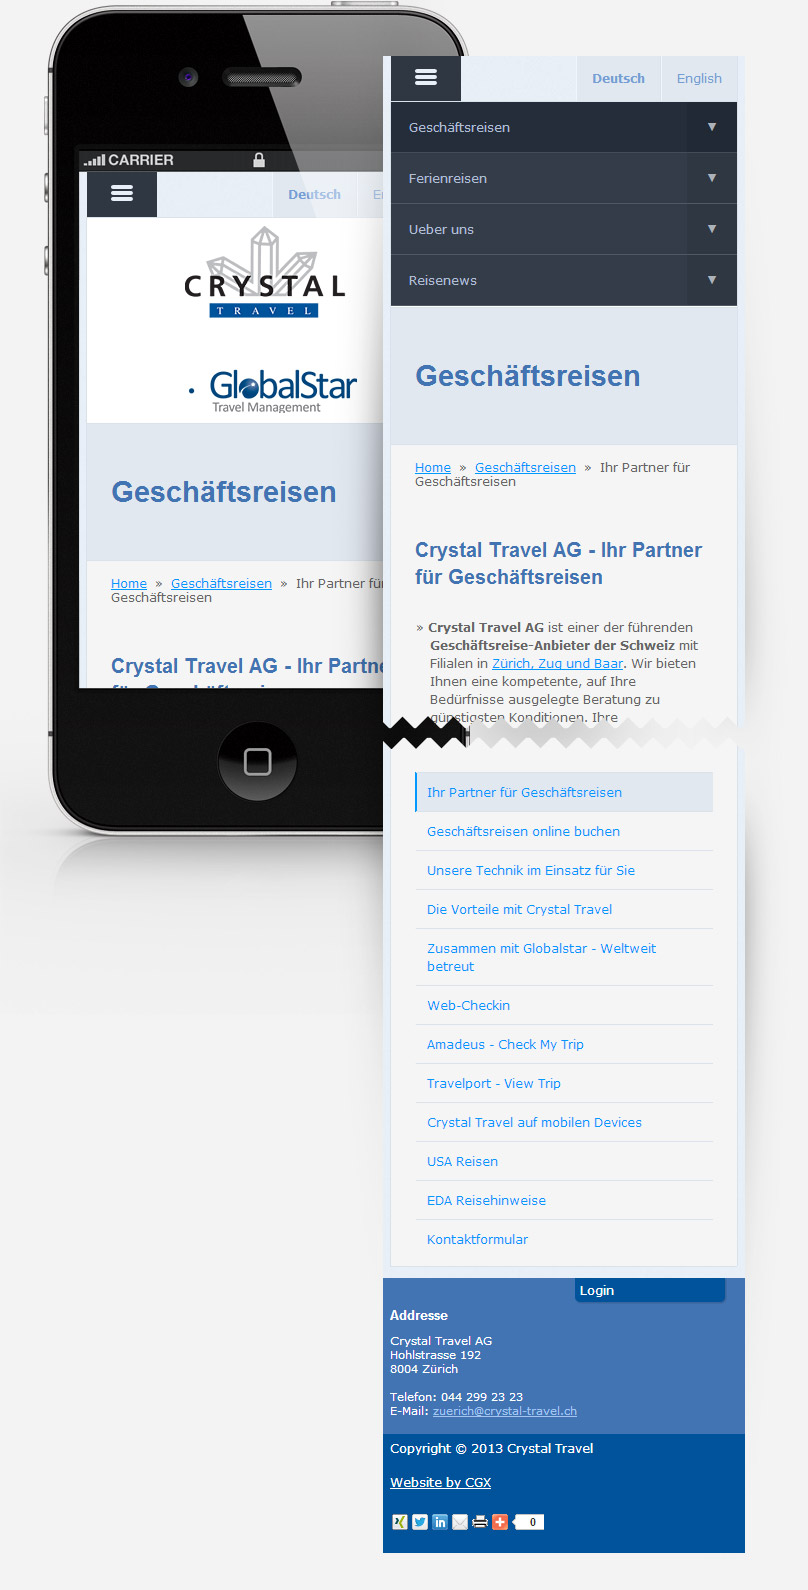 iPad portrait viw of crystal-travel.ch website screenshot